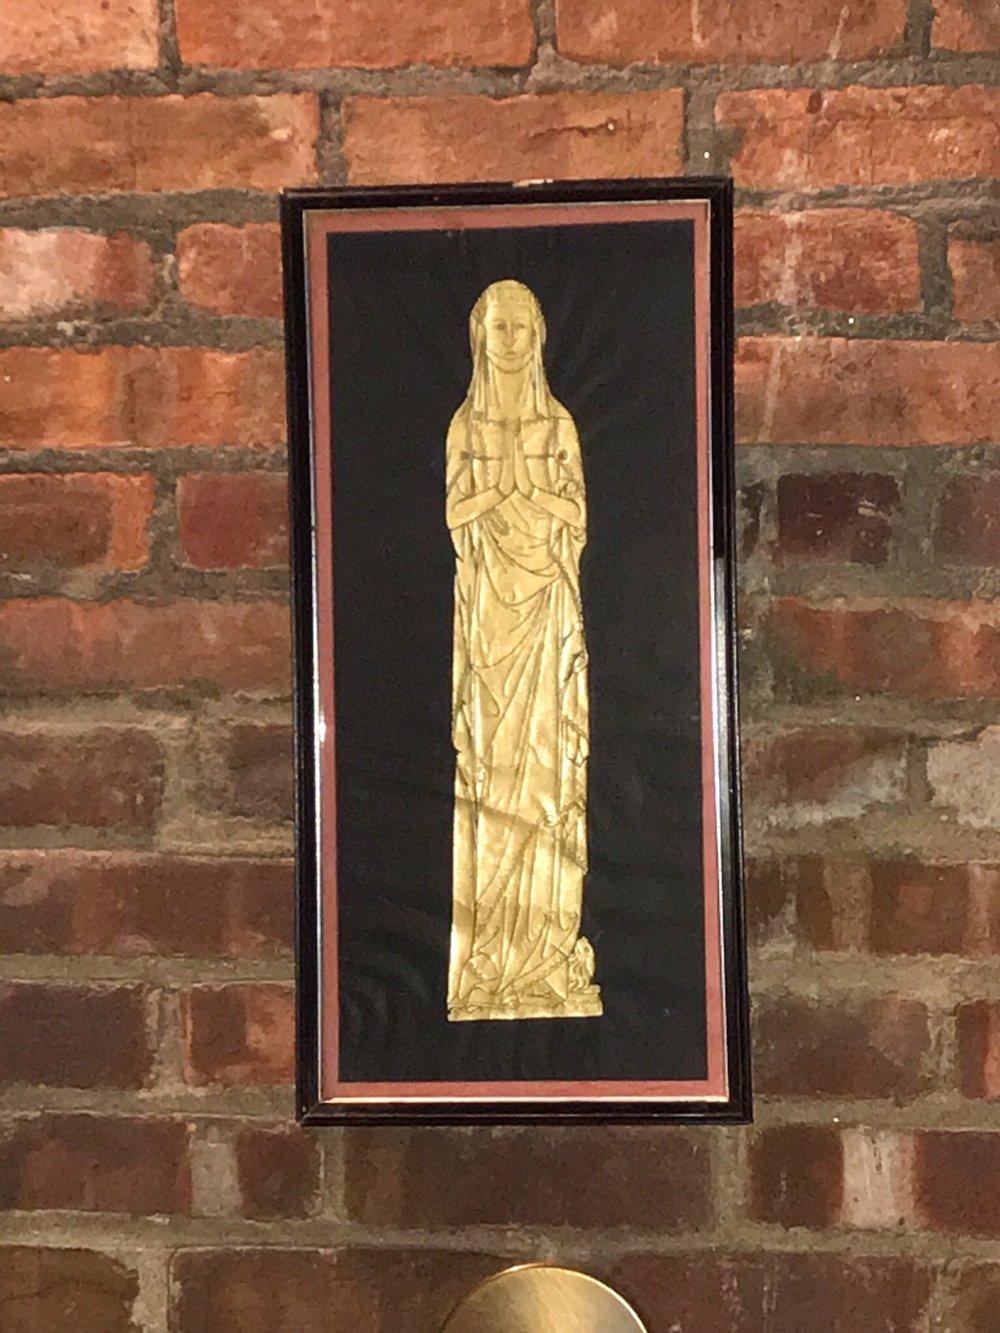 Framed golden figure painting